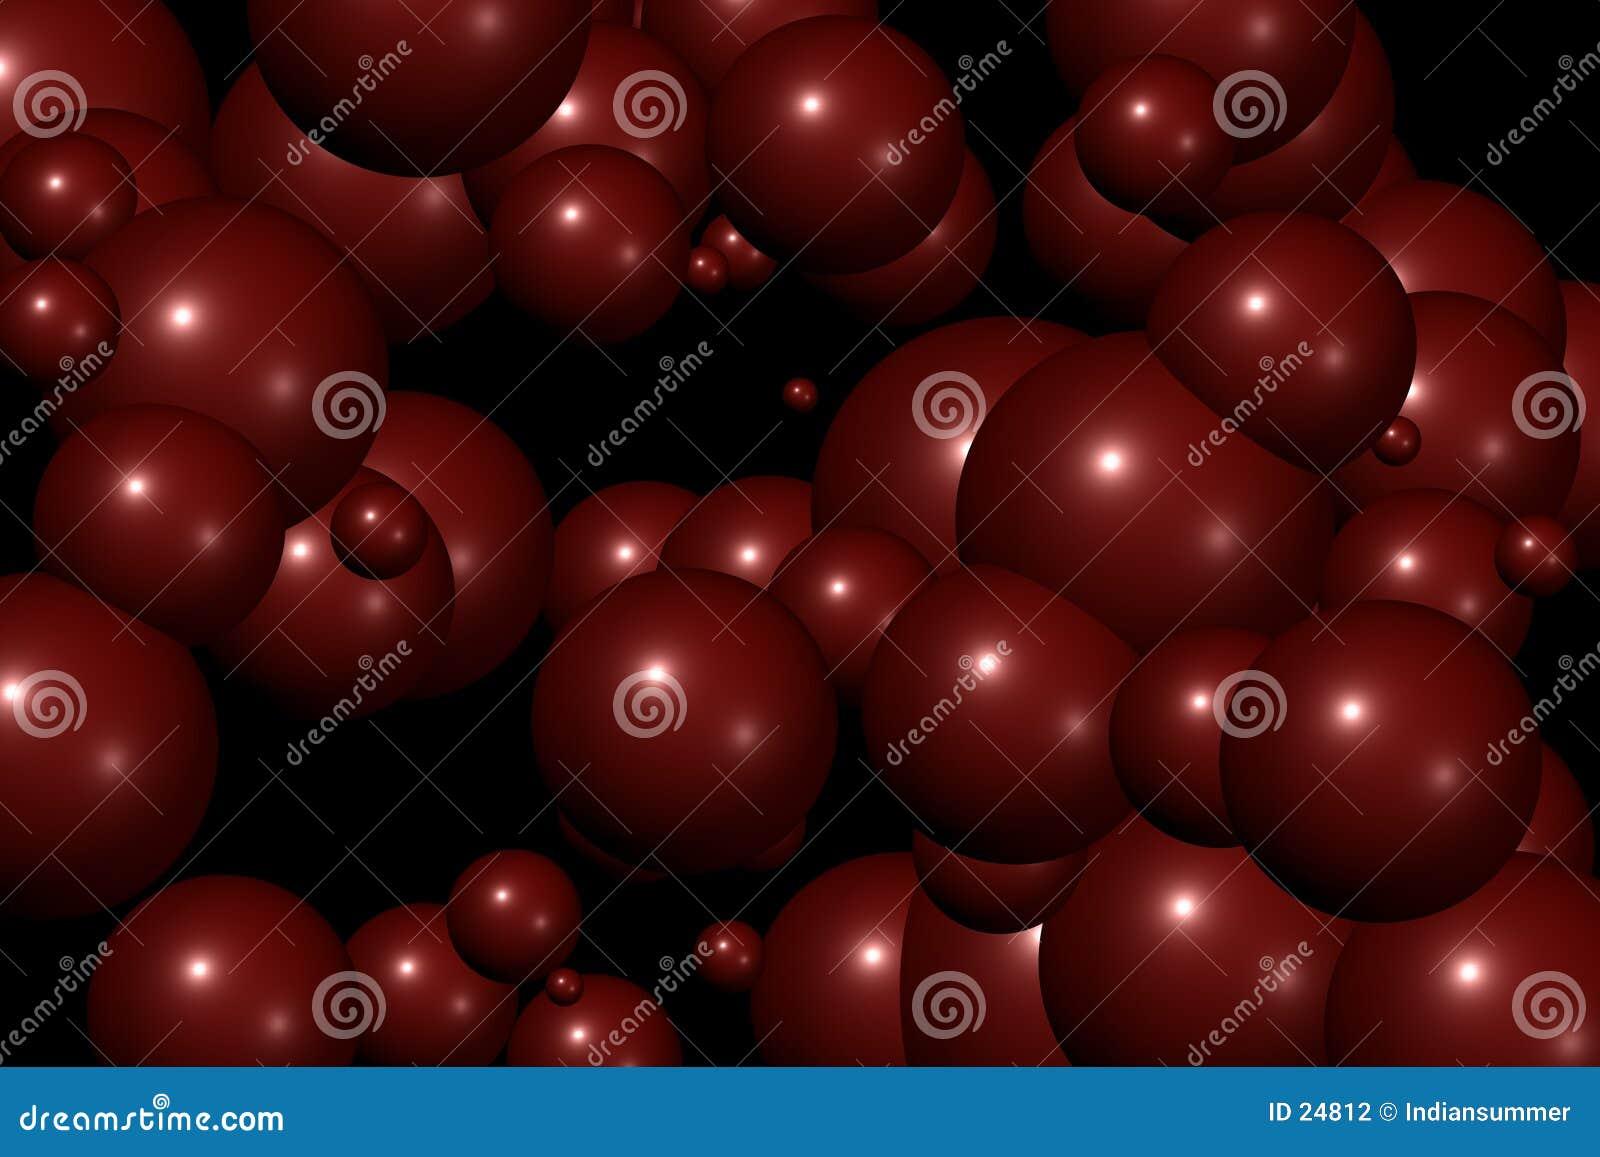 Balls pattern III